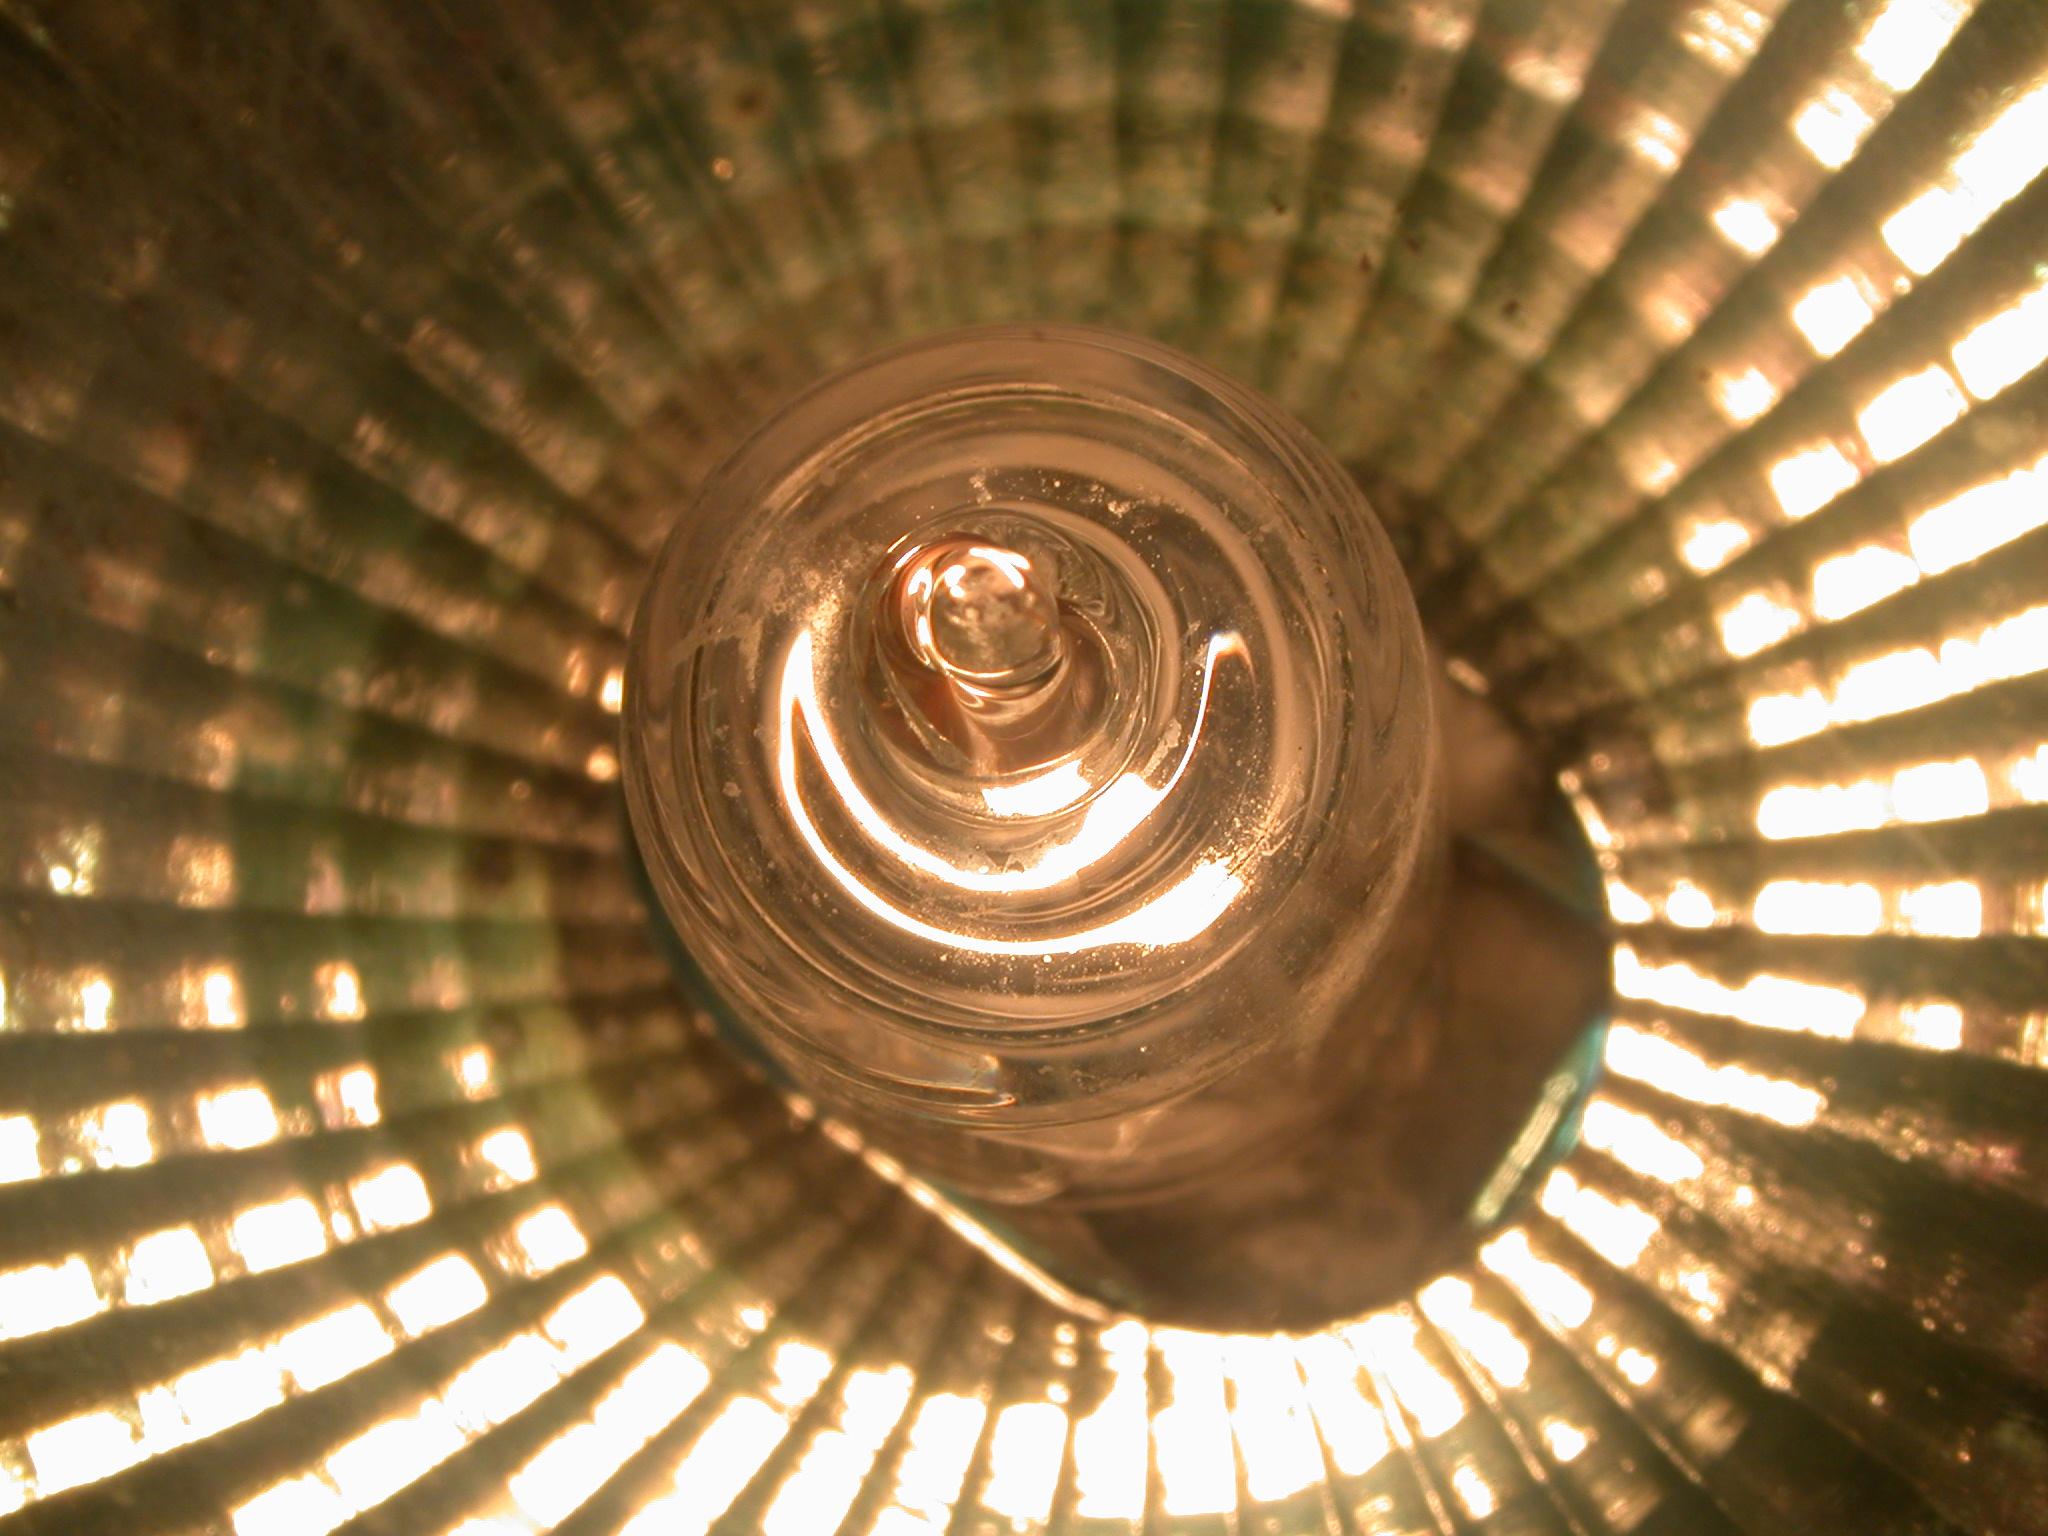 flash bulb flashbulb light flashlight refractal refract refracting gold shine glossy refelcting reflection shine shining shiny